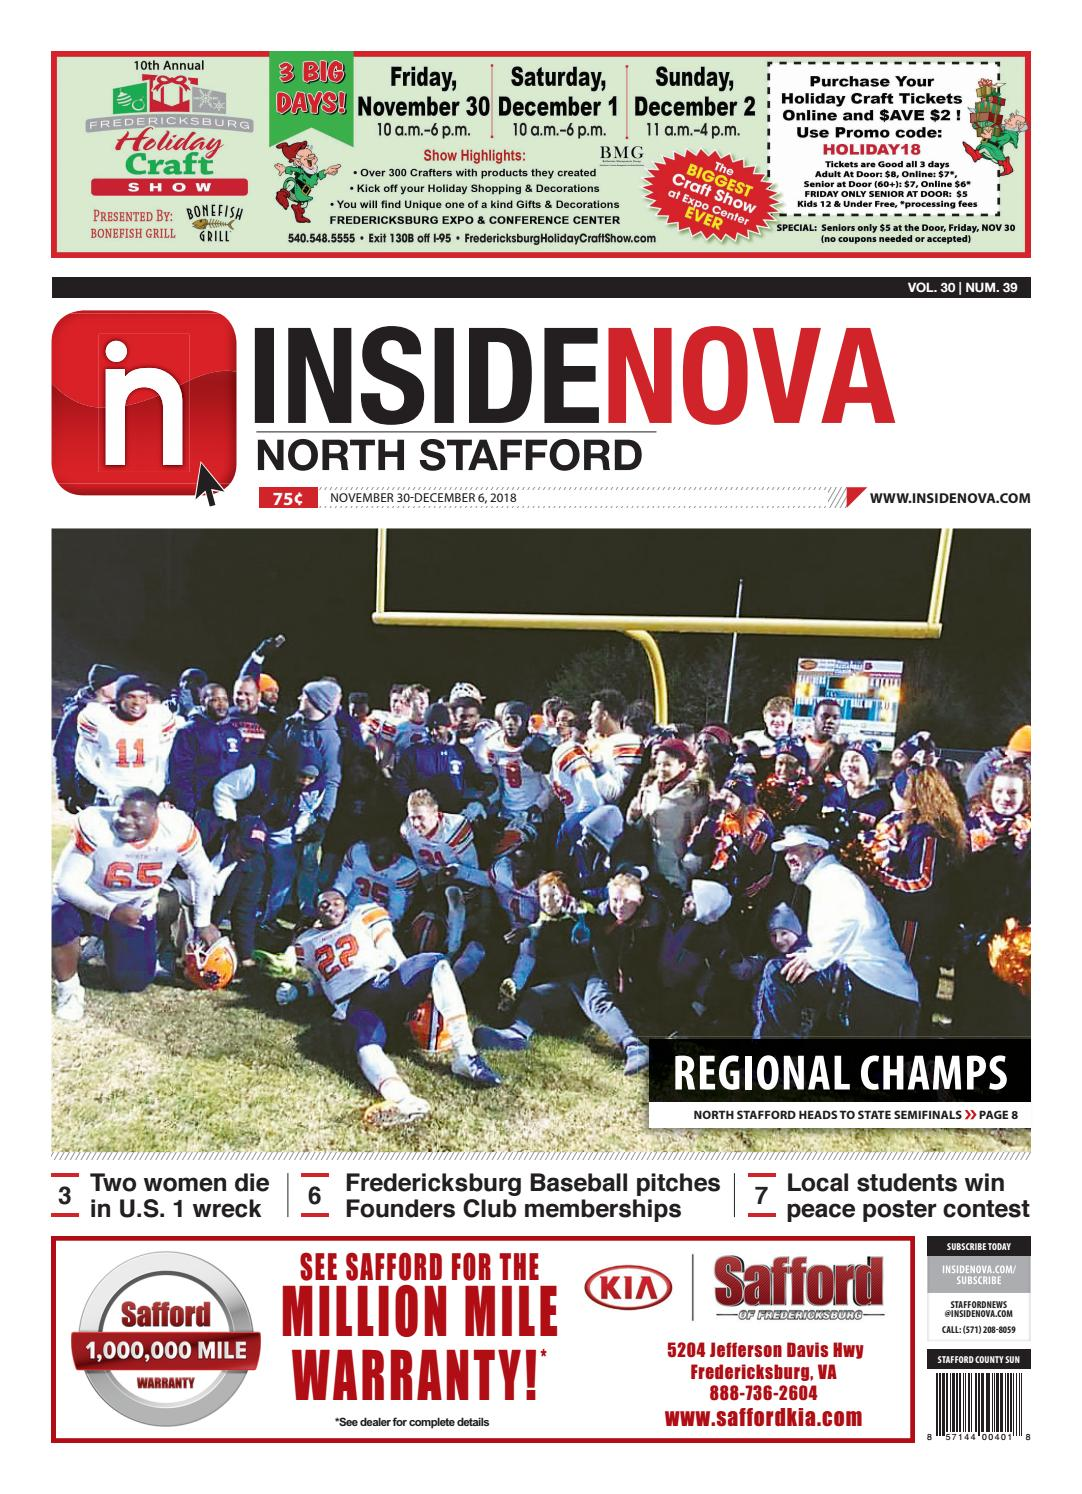 InsideNoVa/North Stafford, November 30, 2018 by InsideNoVa